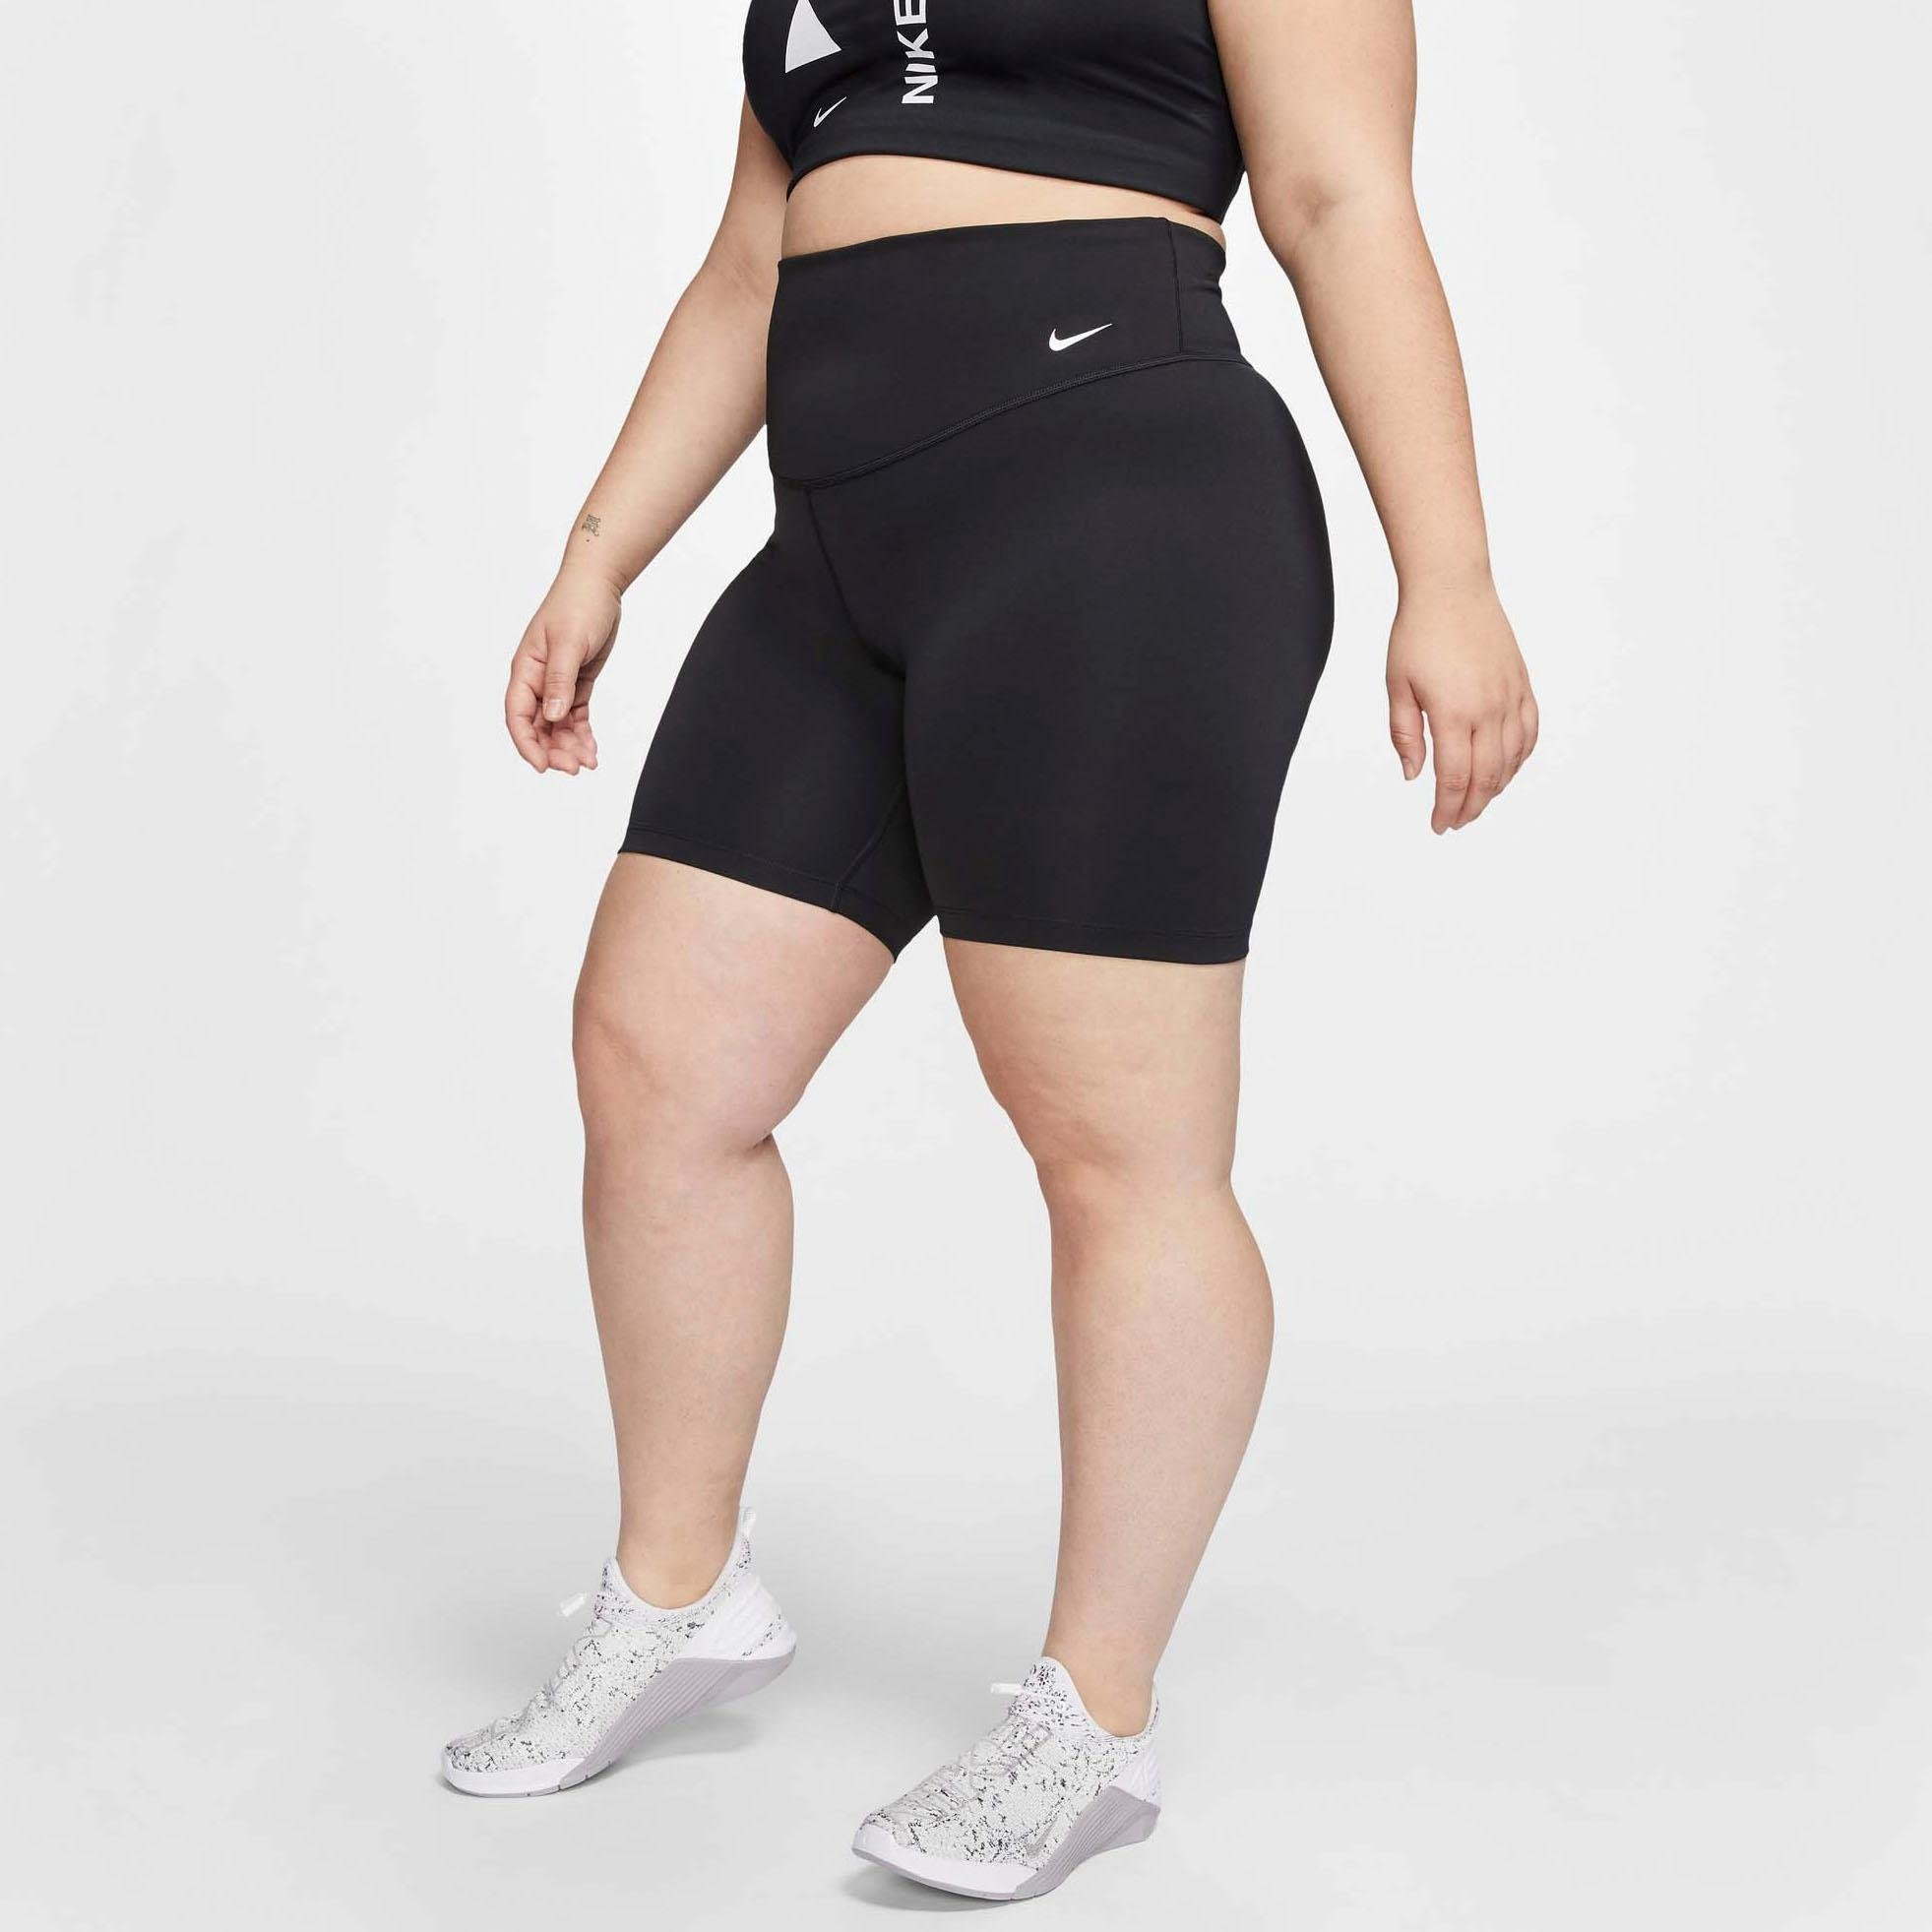 Nike functionele short »7 SHORTS PLUS SIZE« veilig op otto.nl kopen